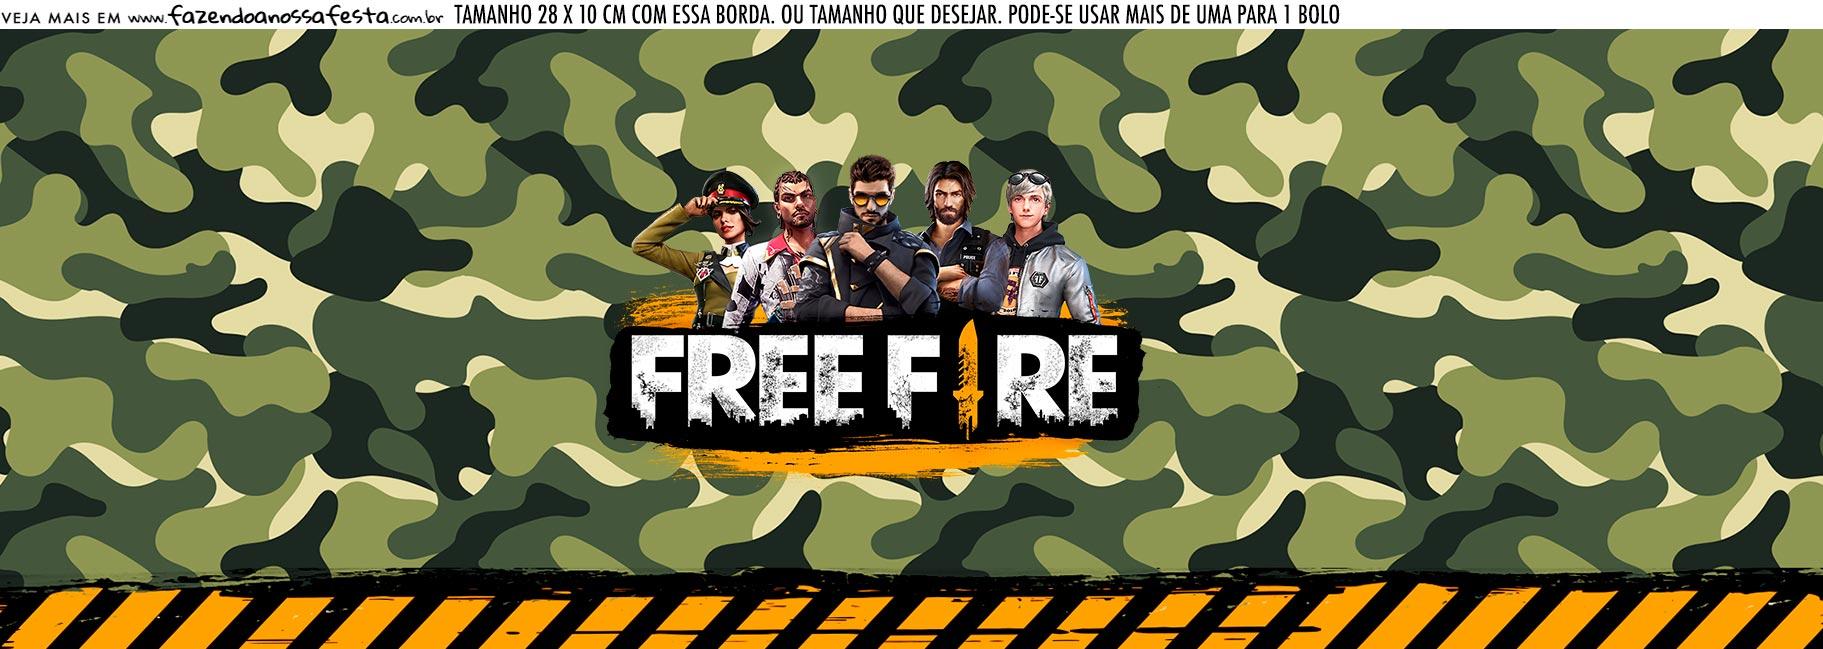 Saia Lateral de Bolo Free Fire